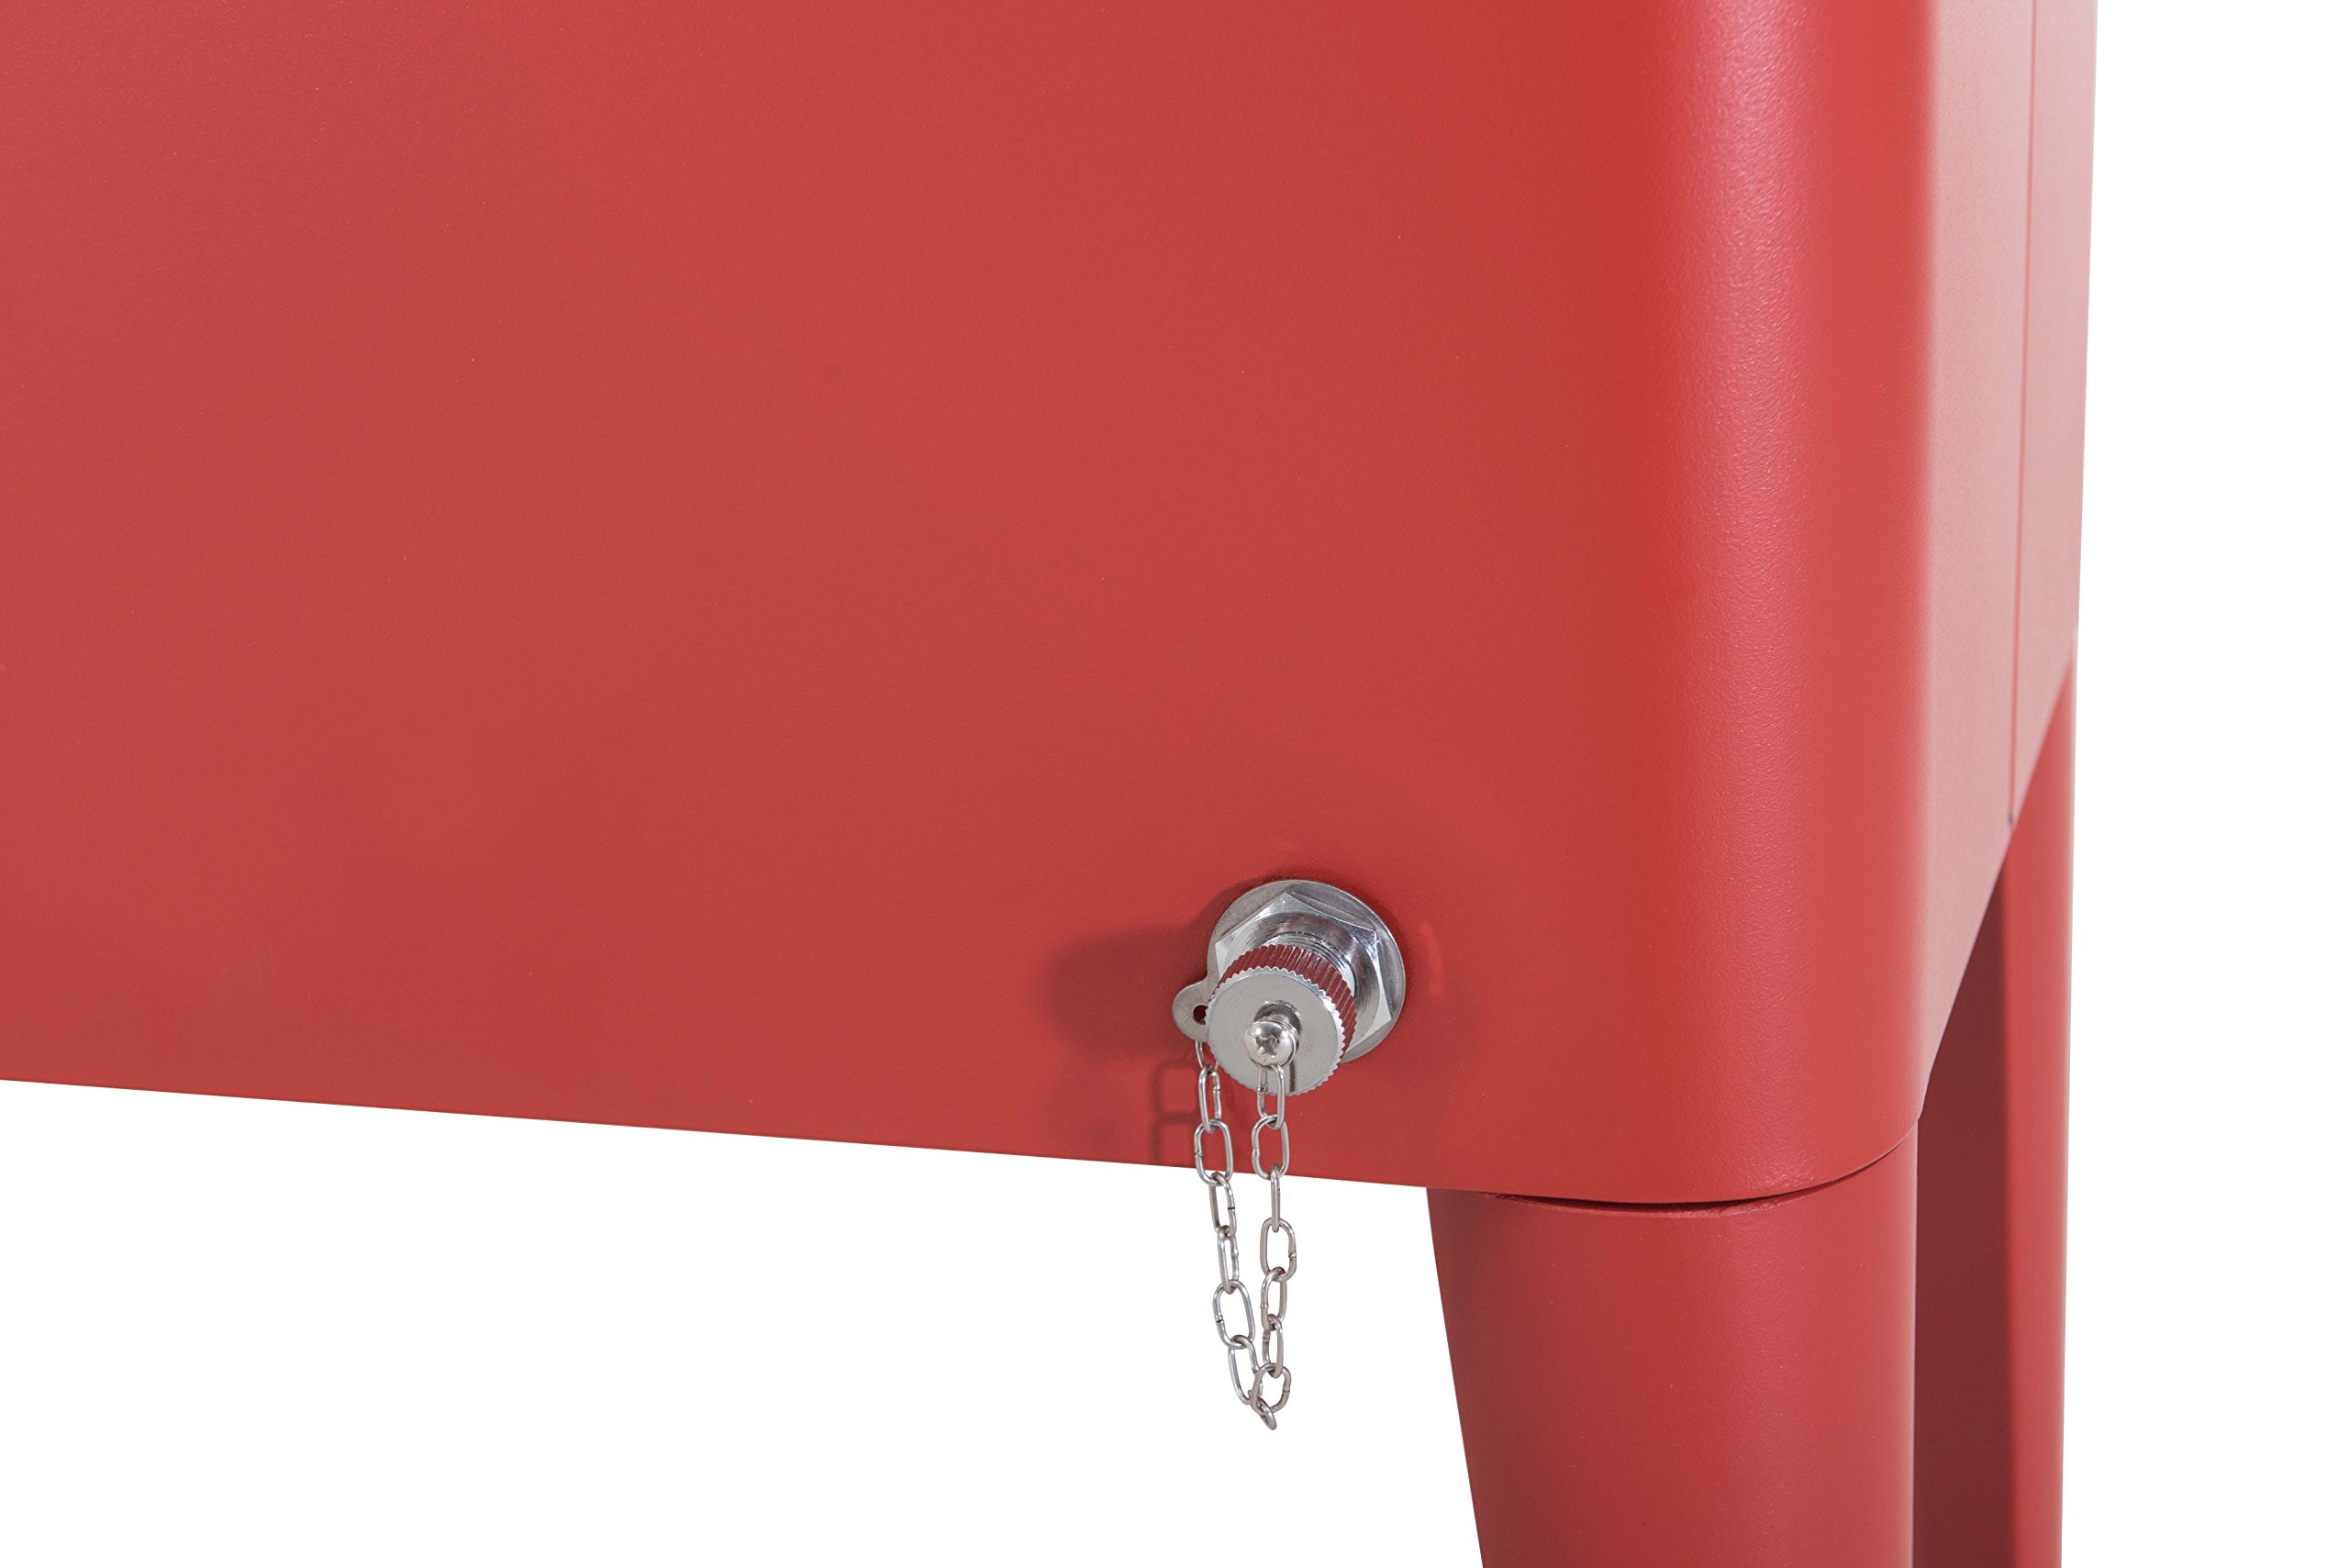 Sunjoy L-BC153PST 60 quart Wheeled Beverage Cooler in Red by sunjoy (Image #9)